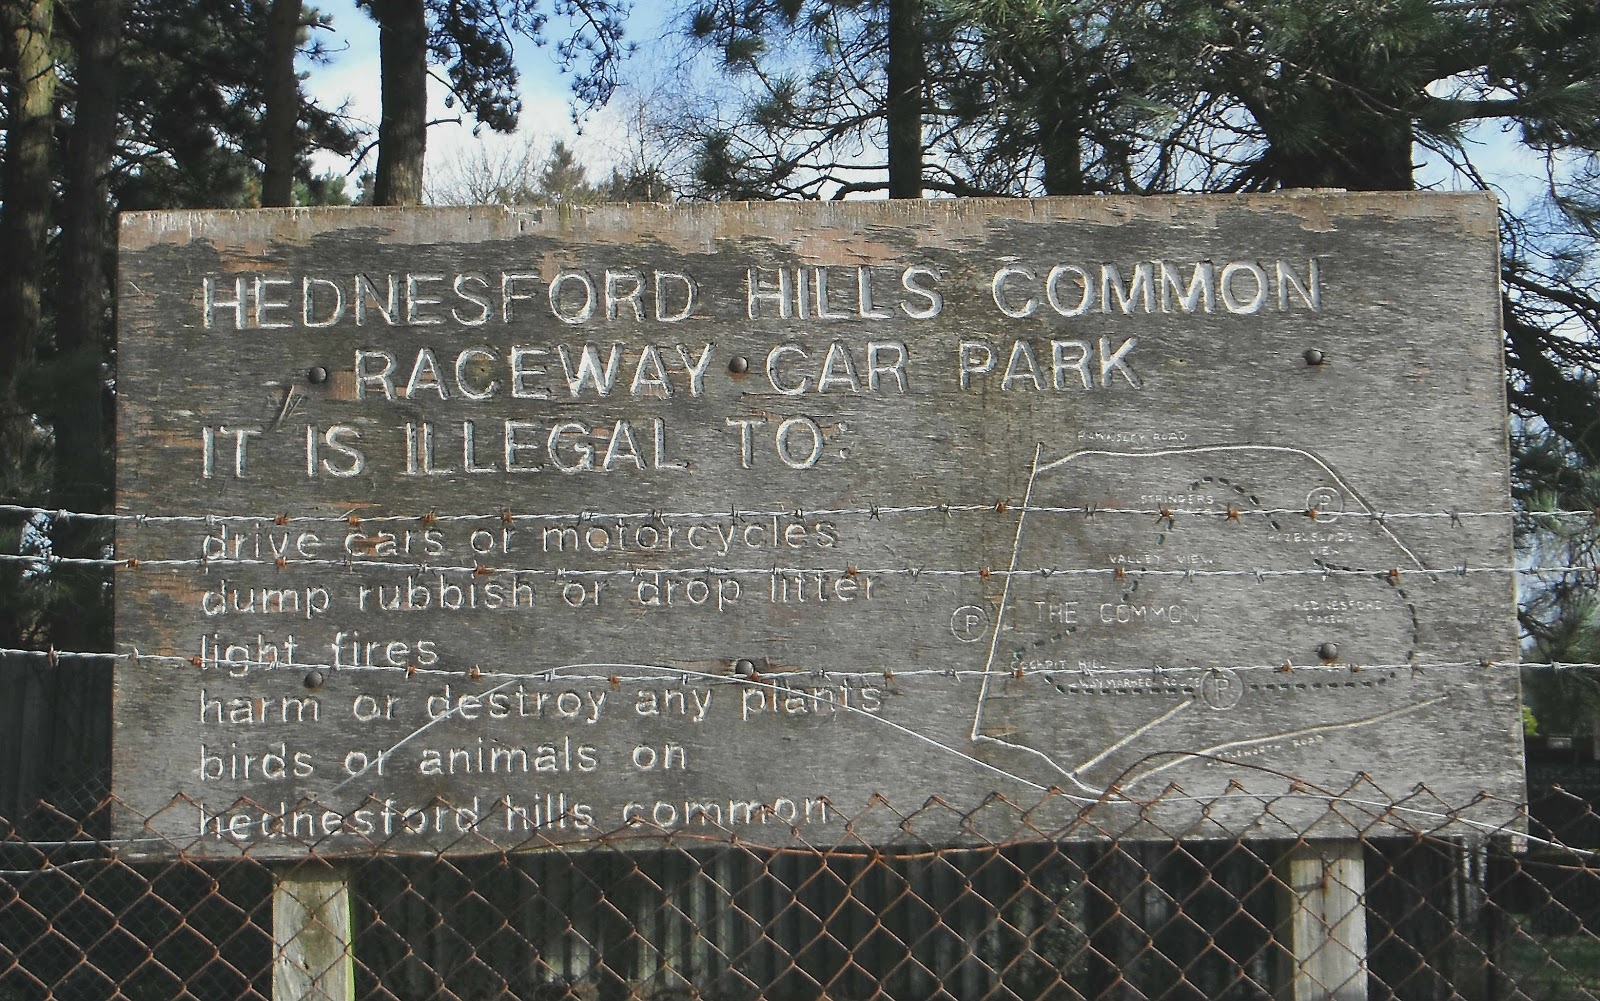 Hednesford Hills Raceway car park sign